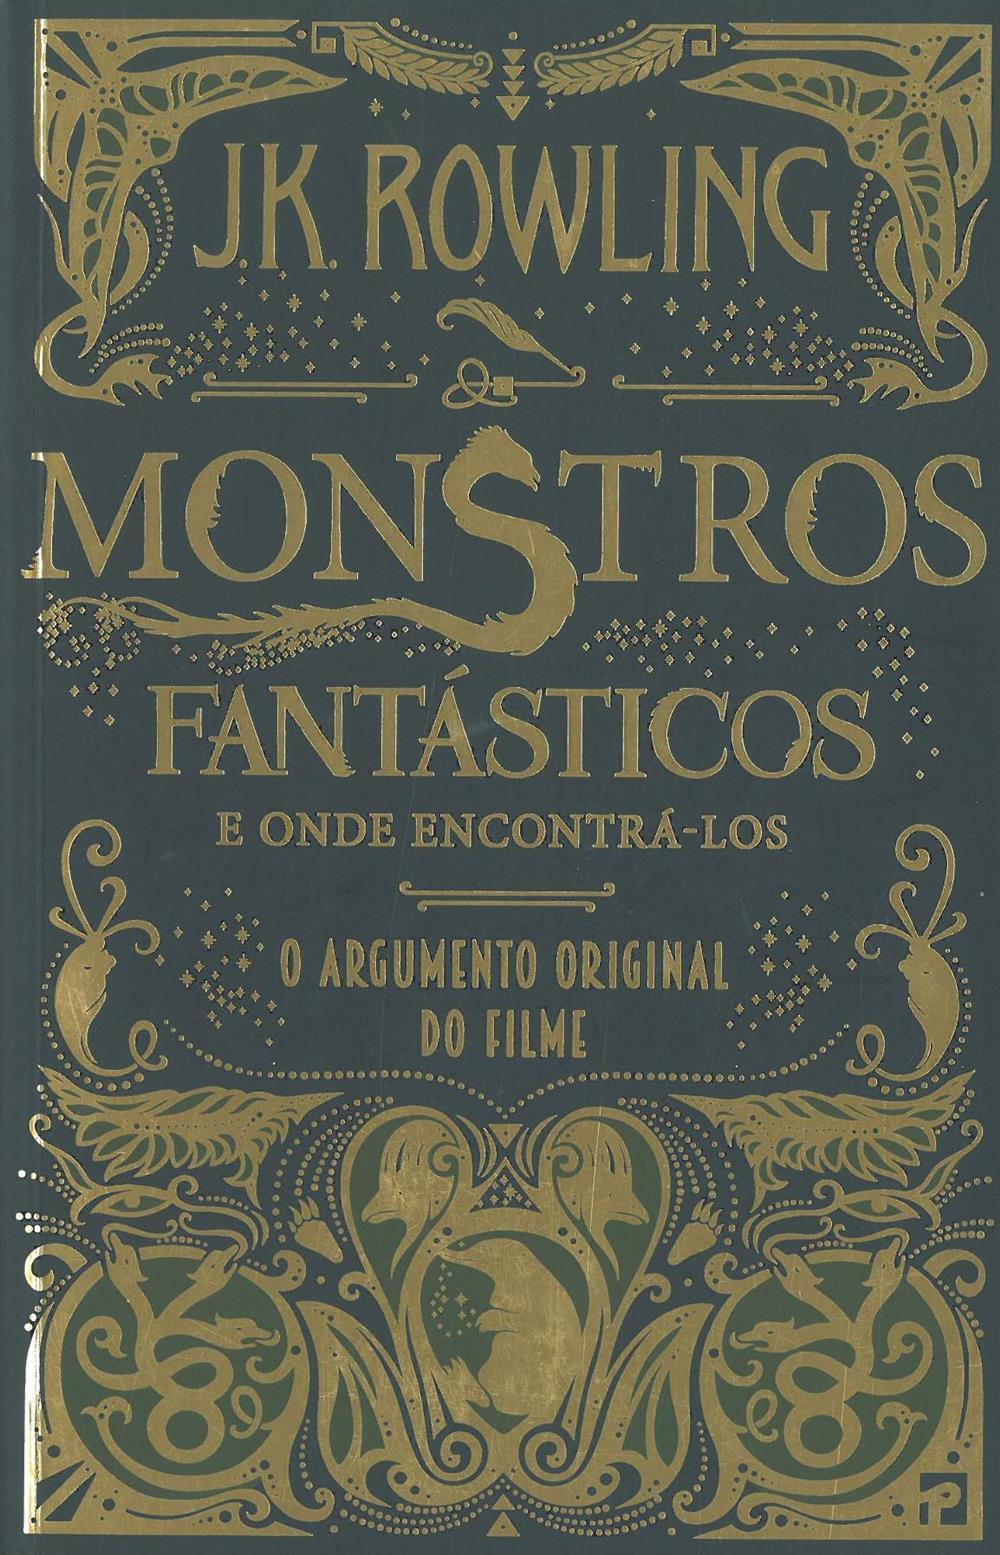 Monstros fantásticos_.jpg